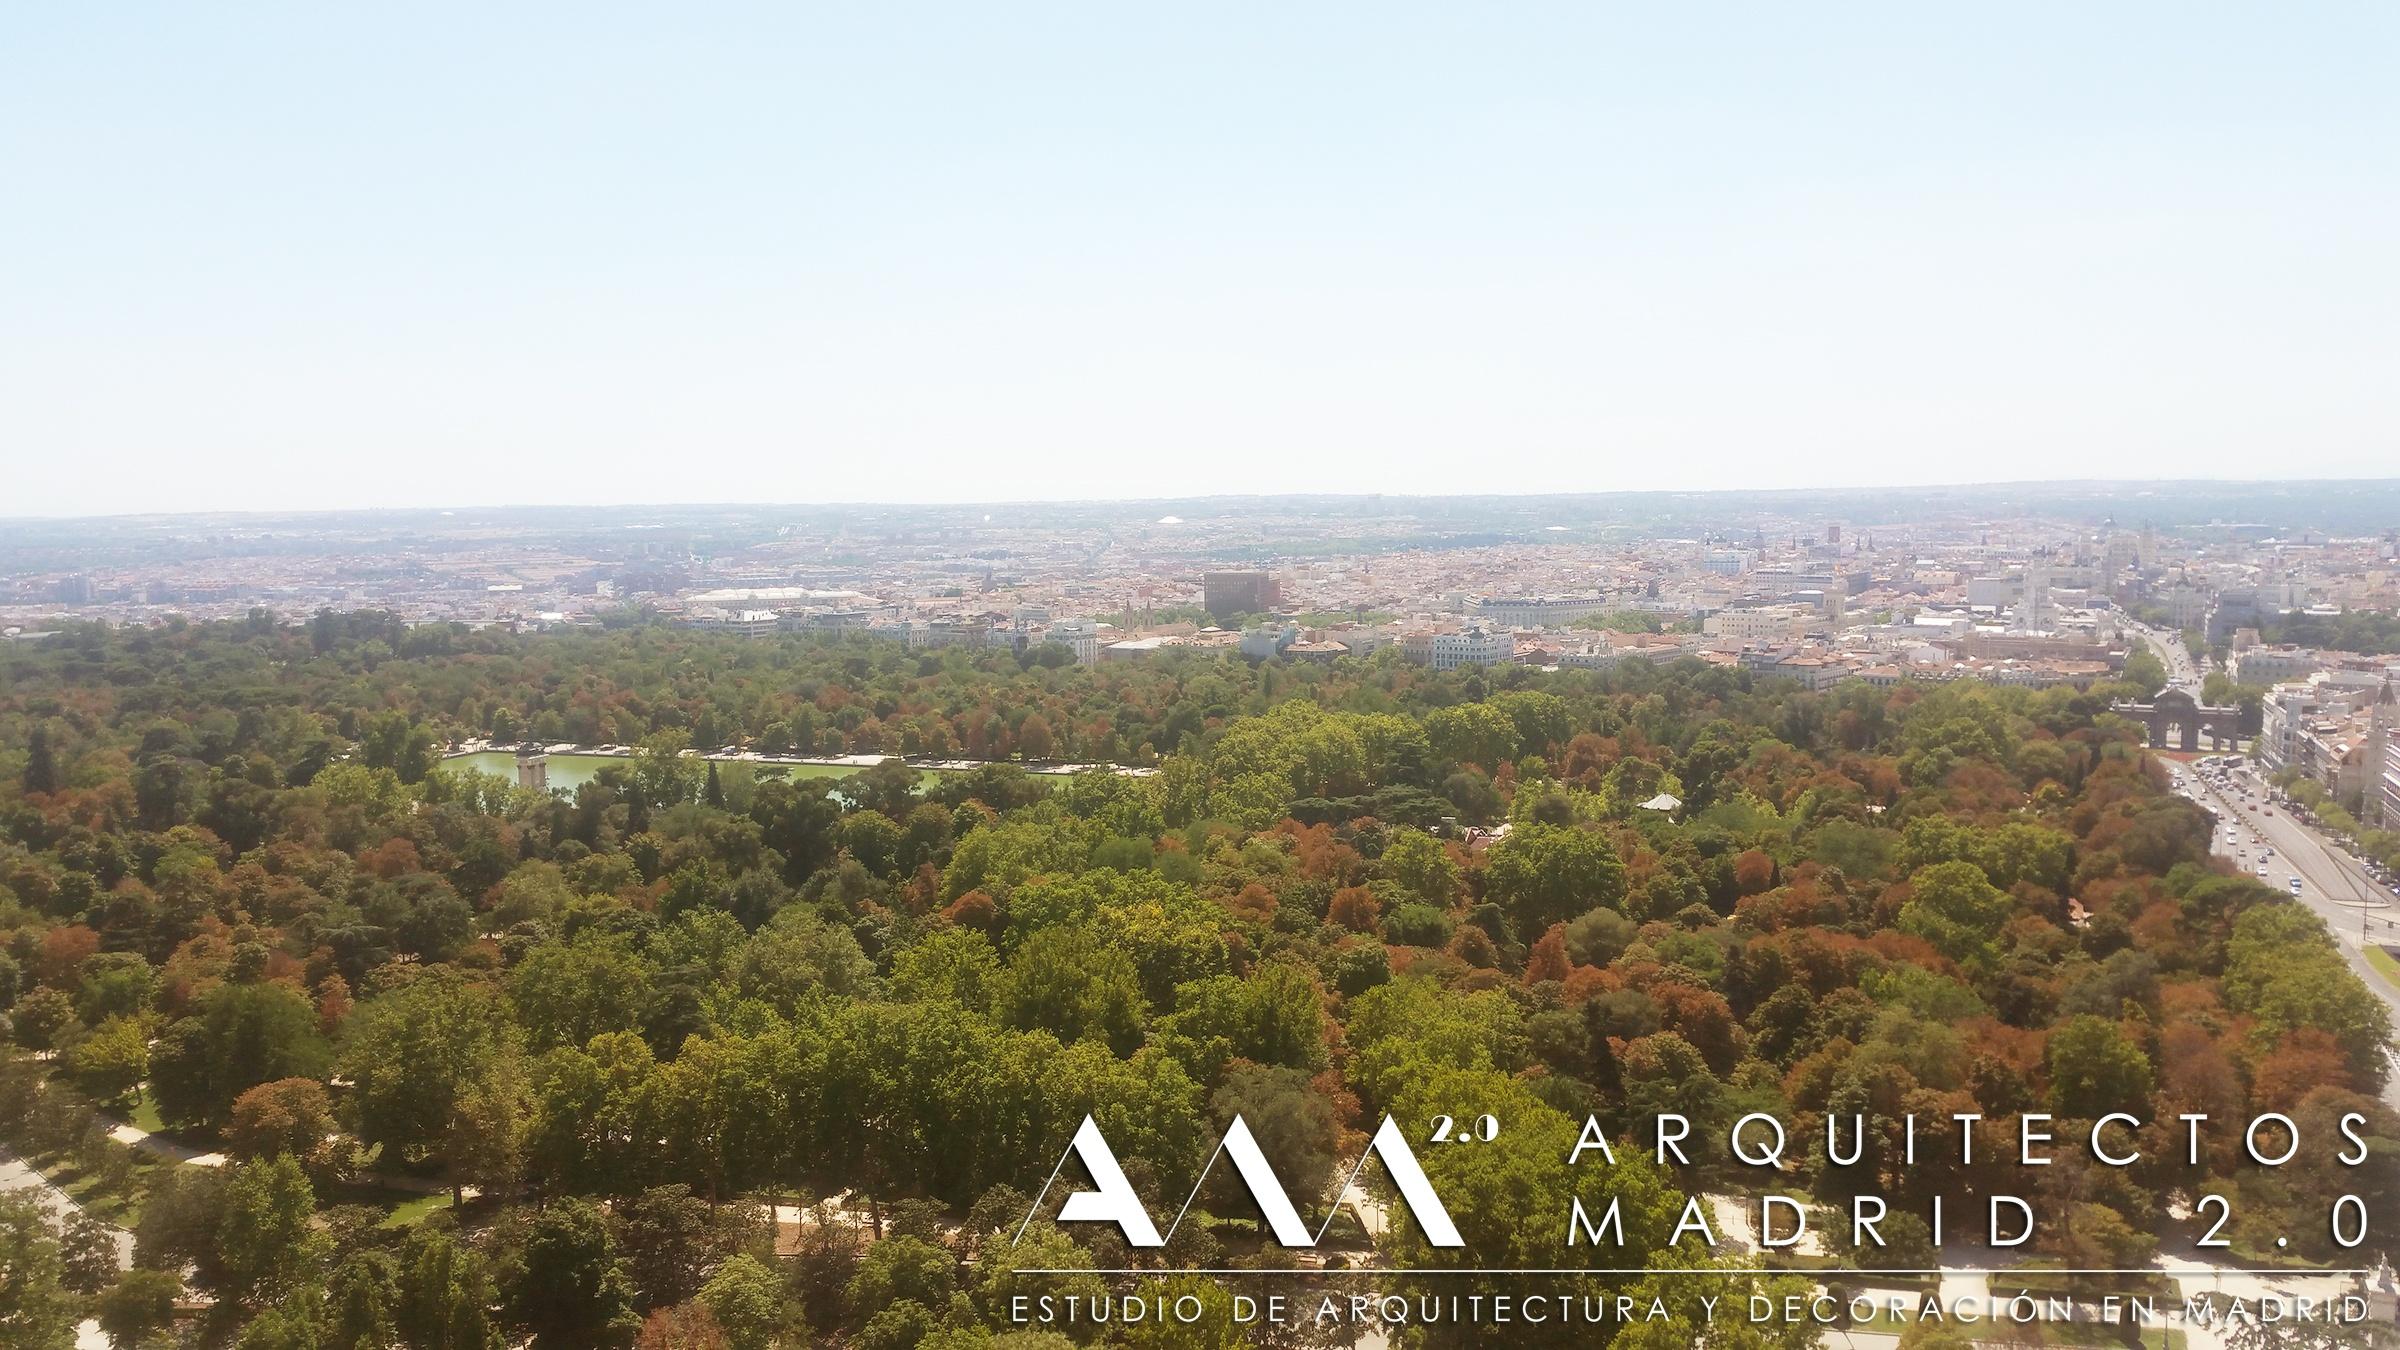 vistas-madrid-desde-torre-valencia-retiro-arquitectos-madrid